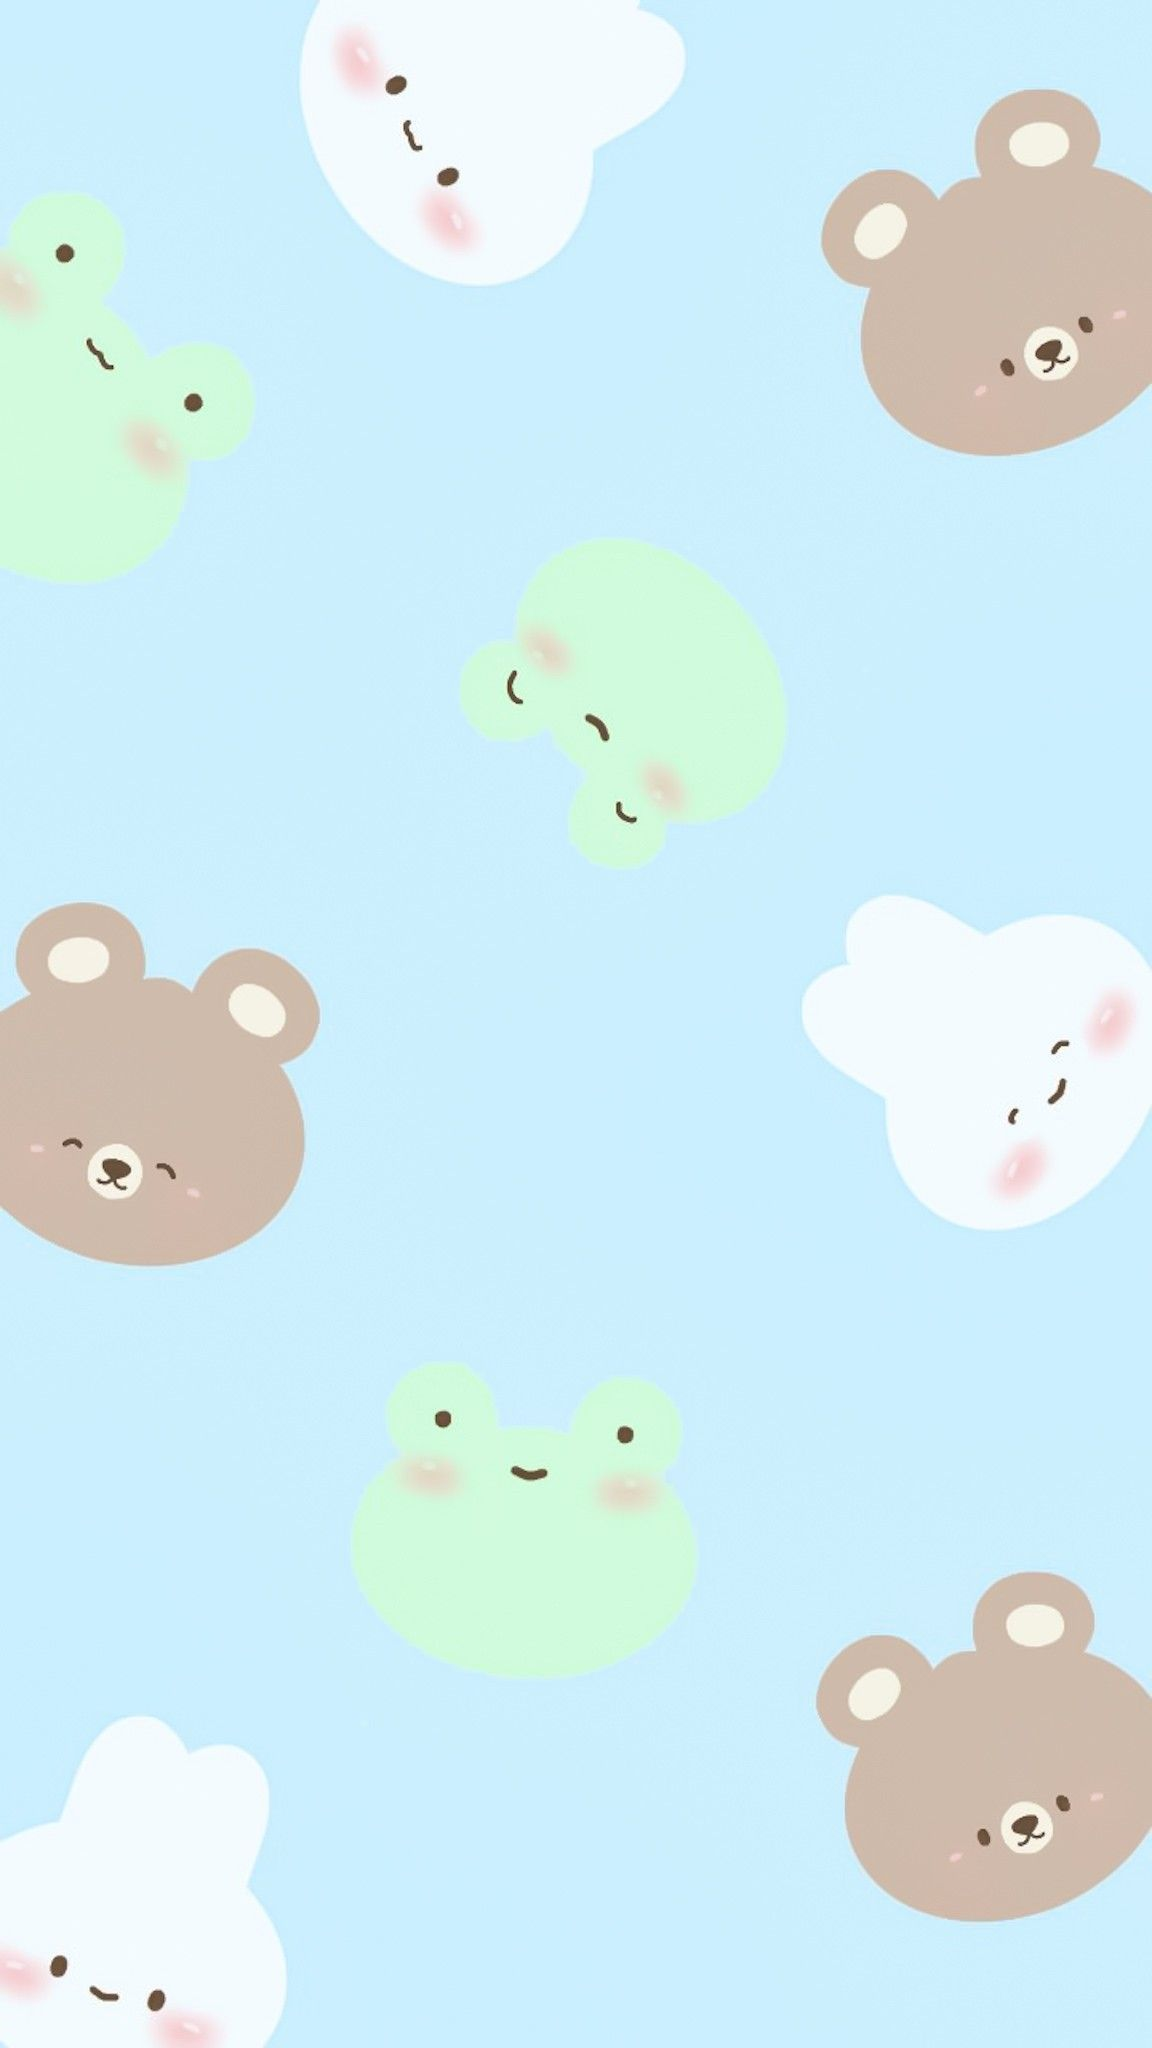 Pin By Aekkalisa On Wallpaper Cute Home Screen Wallpaper Soft Wallpapers Kawaii Iphone Wallpaper